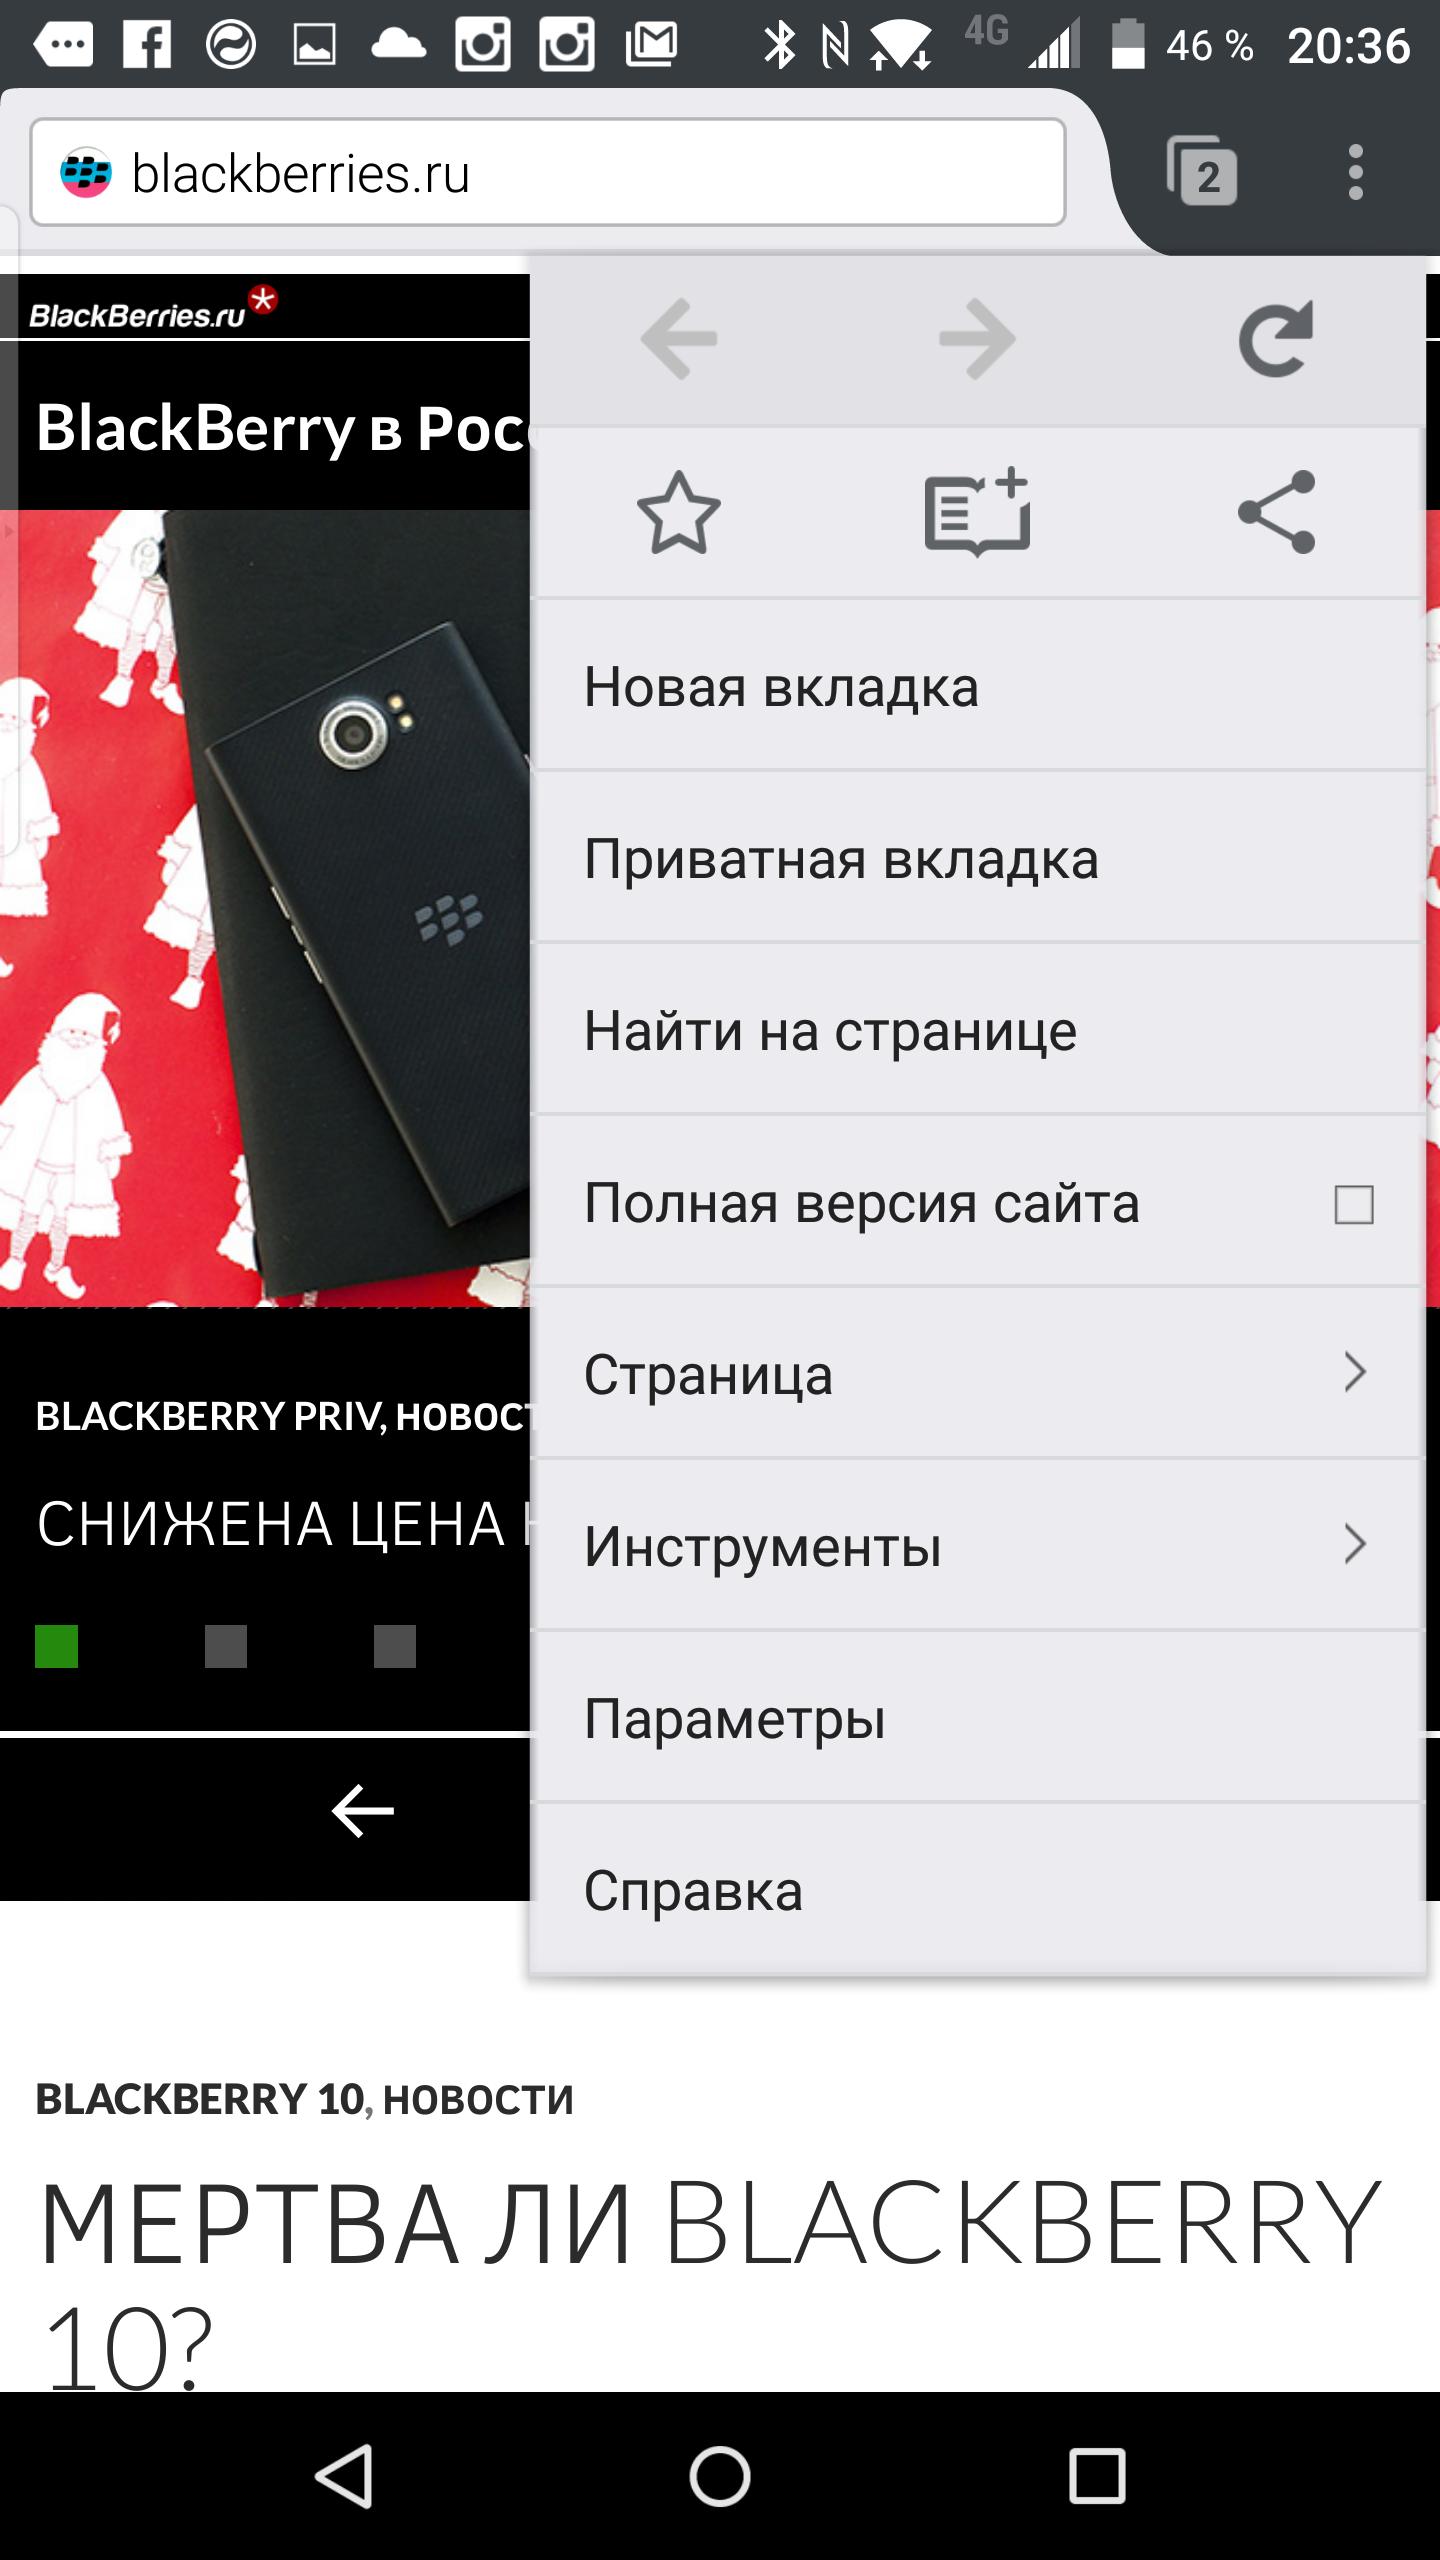 Screenshot_2016-01-11-20-36-19